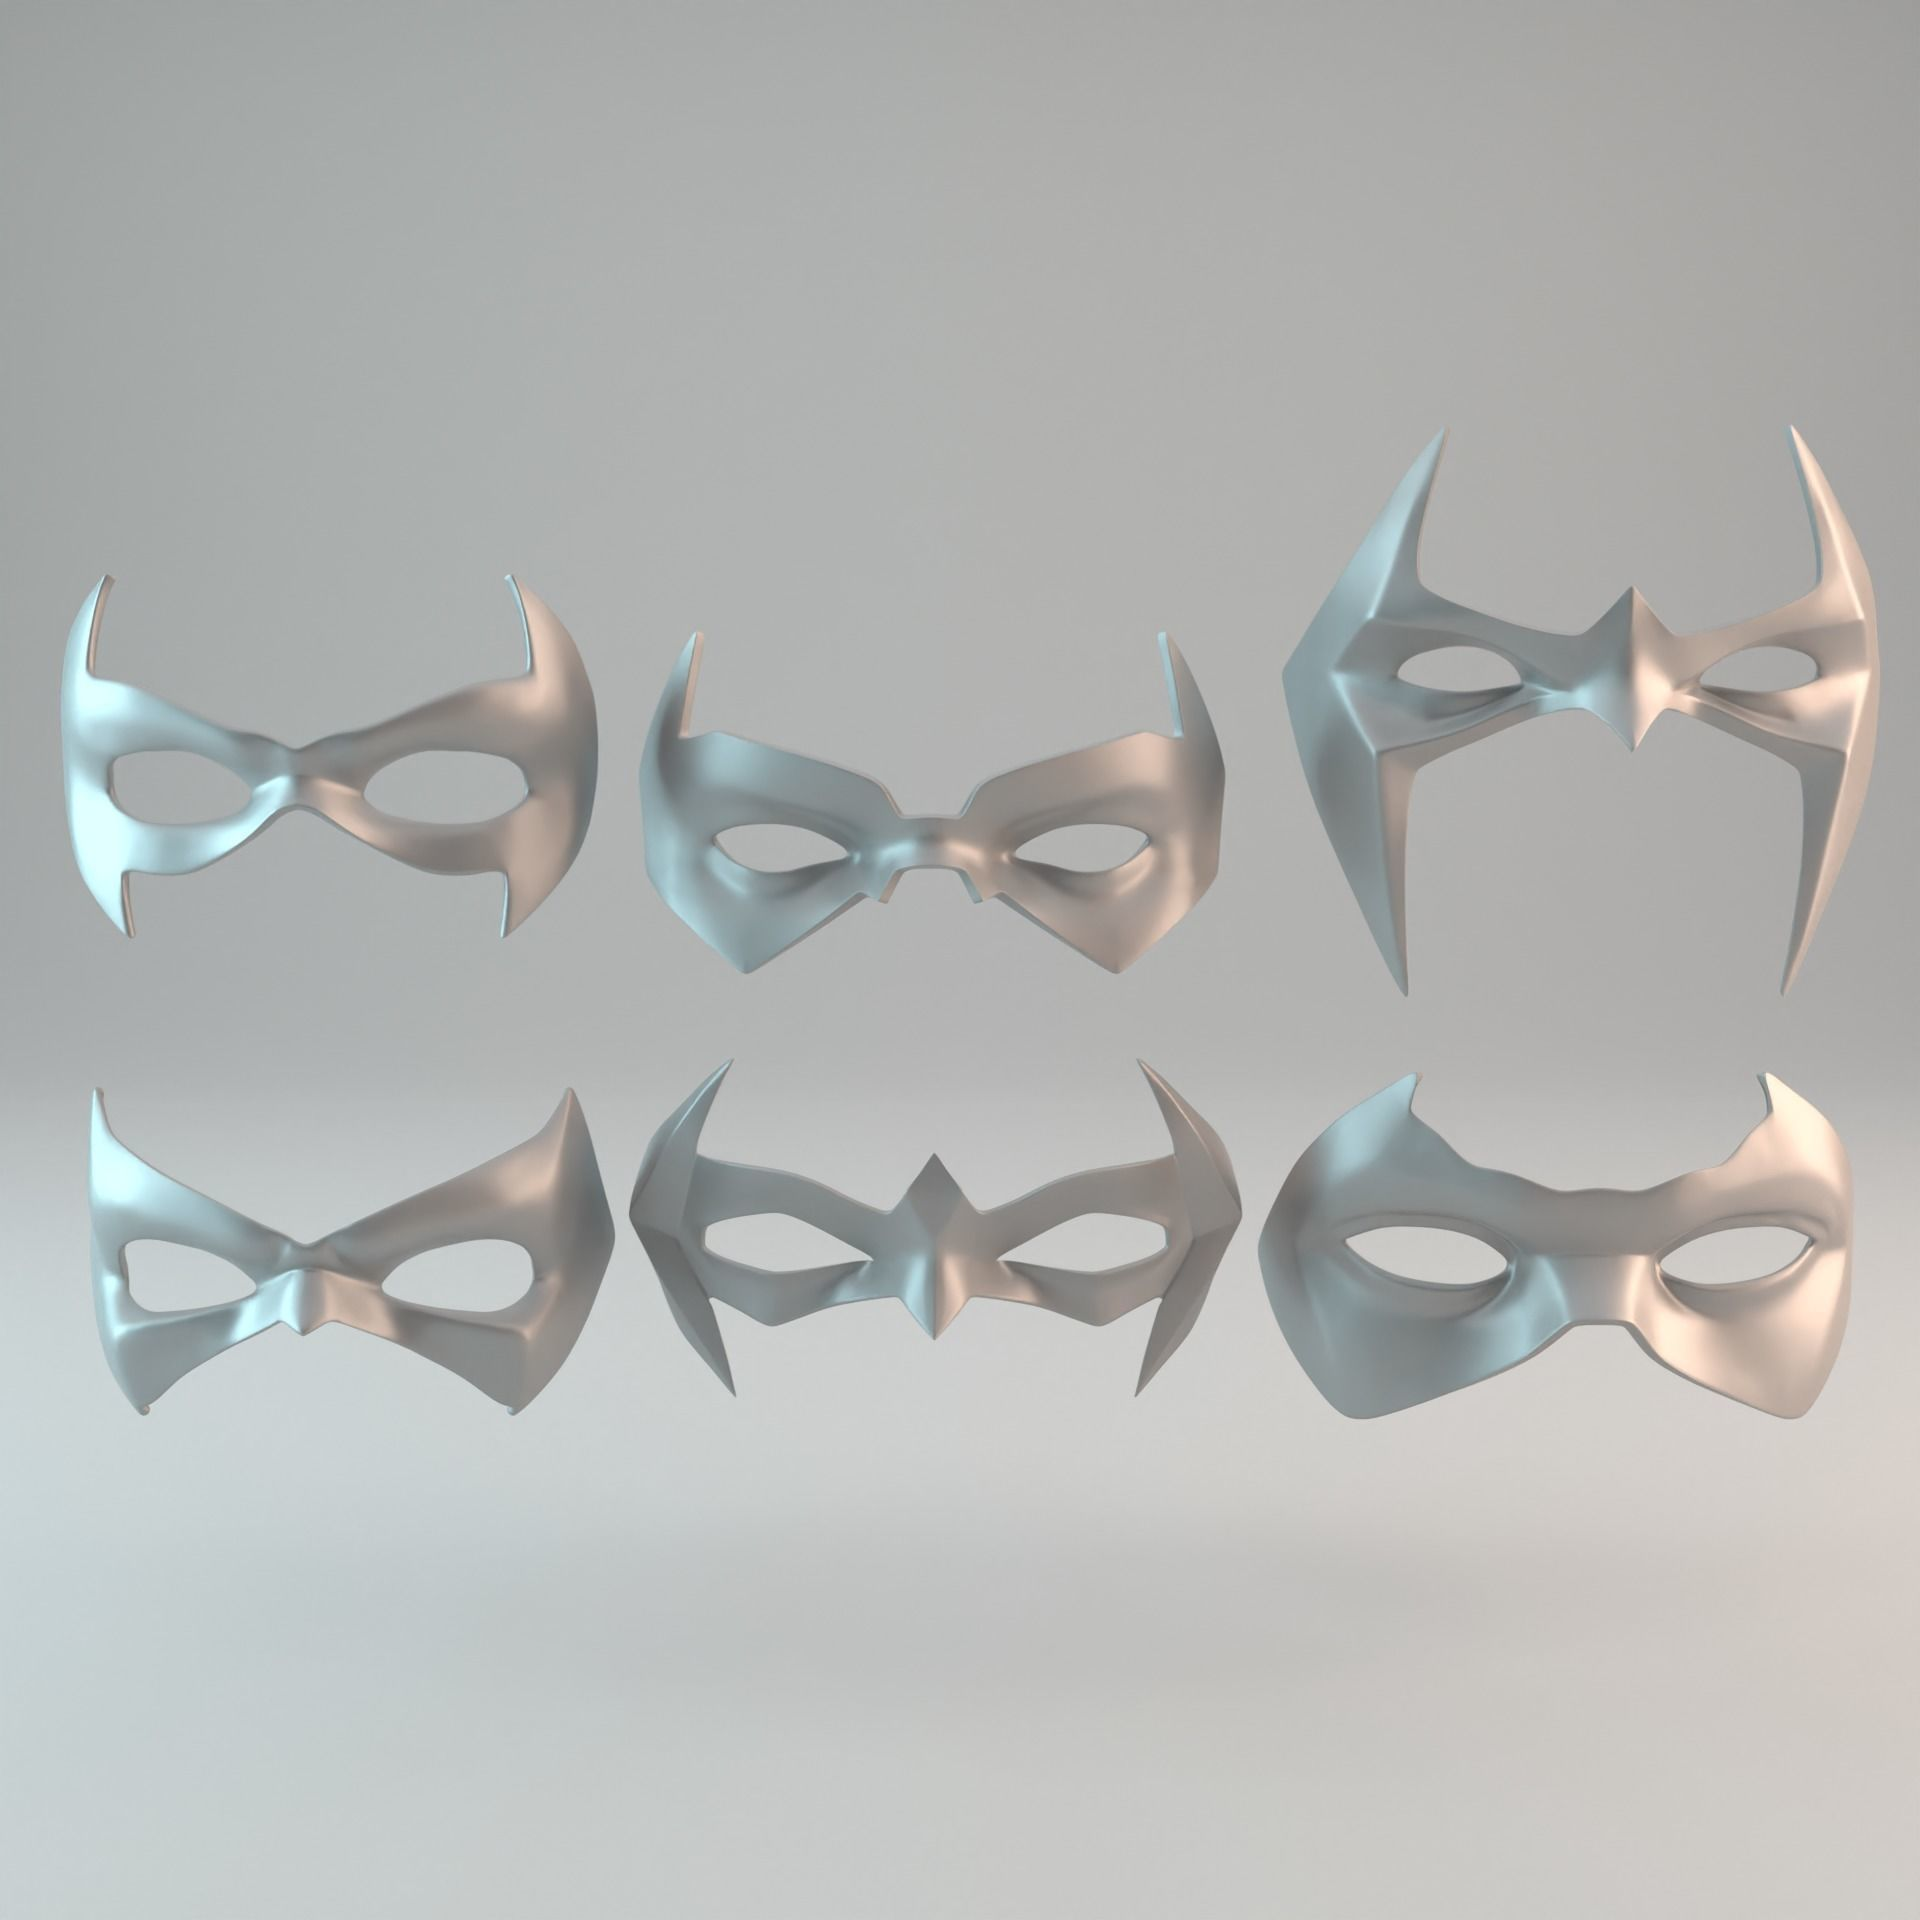 6 Batman sidekicks eye masks